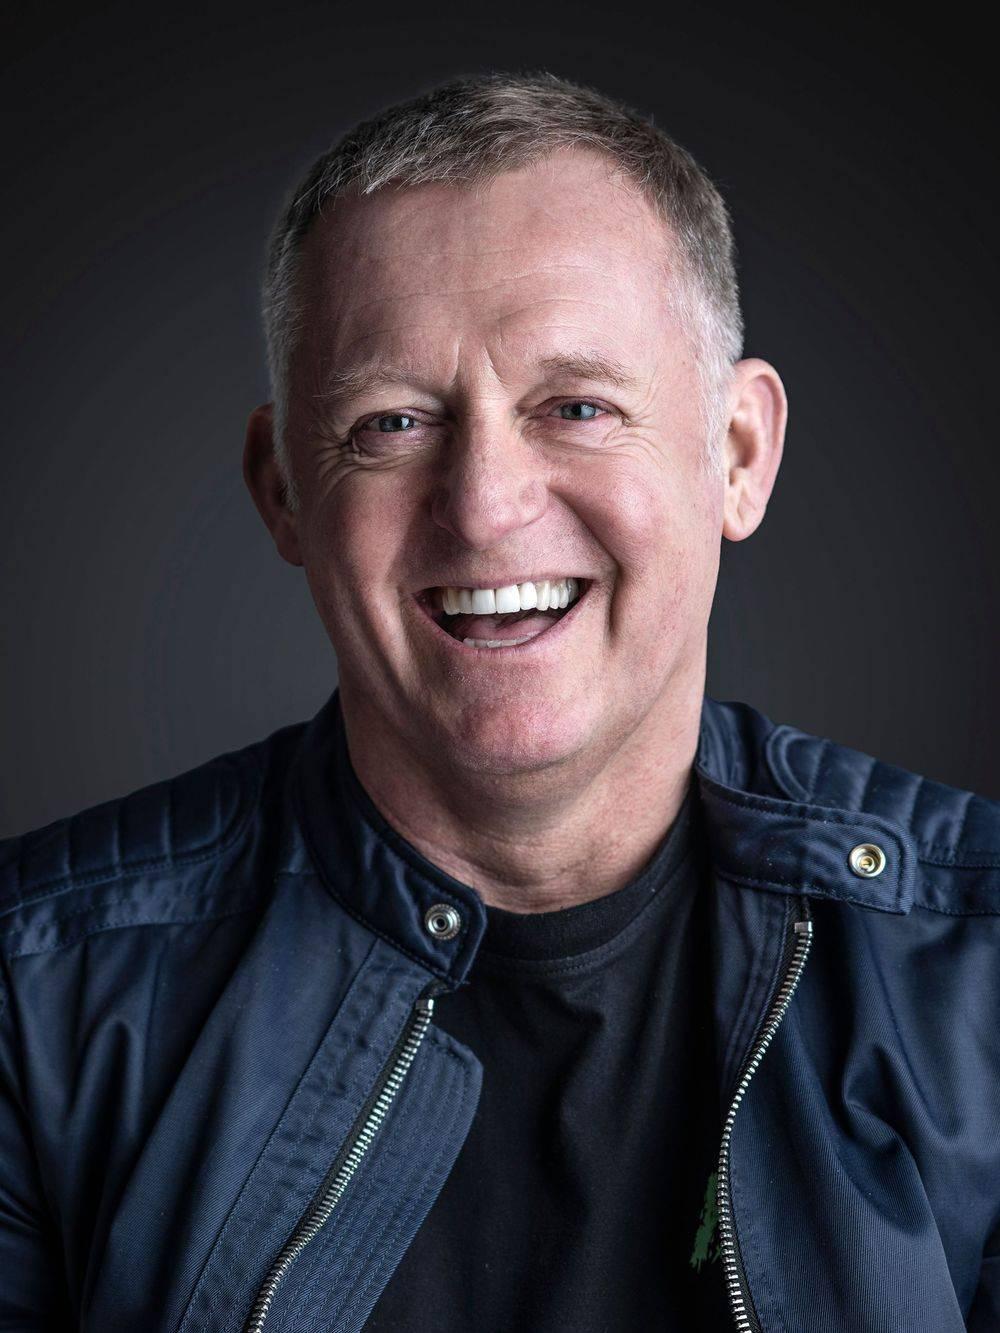 Dean Forster Stunt Coordinator